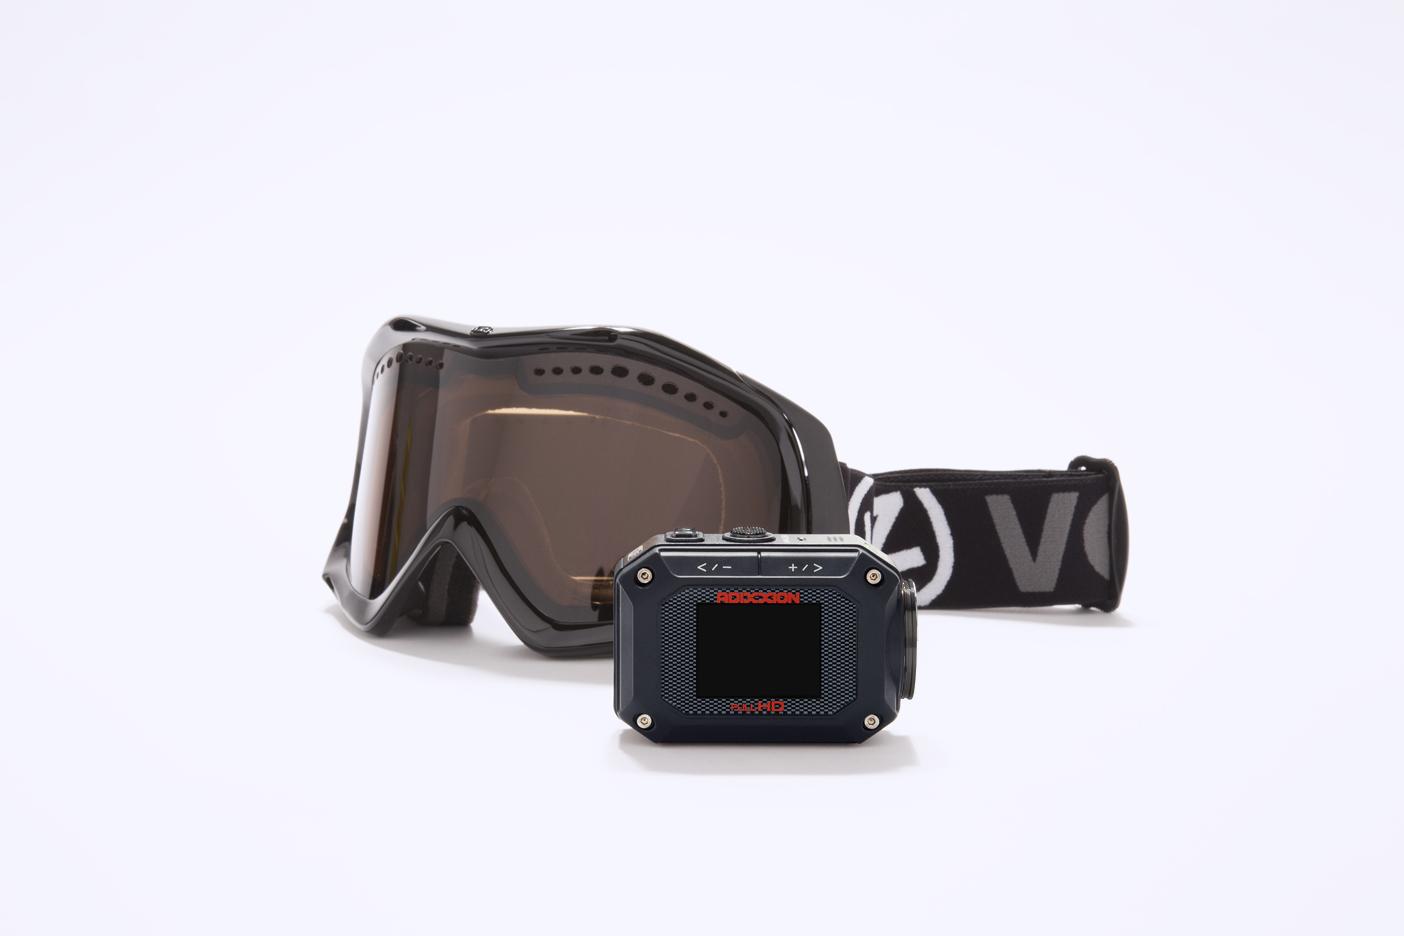 JVC GC-XA2 Adixxion: l'action cam per gli sport invernali